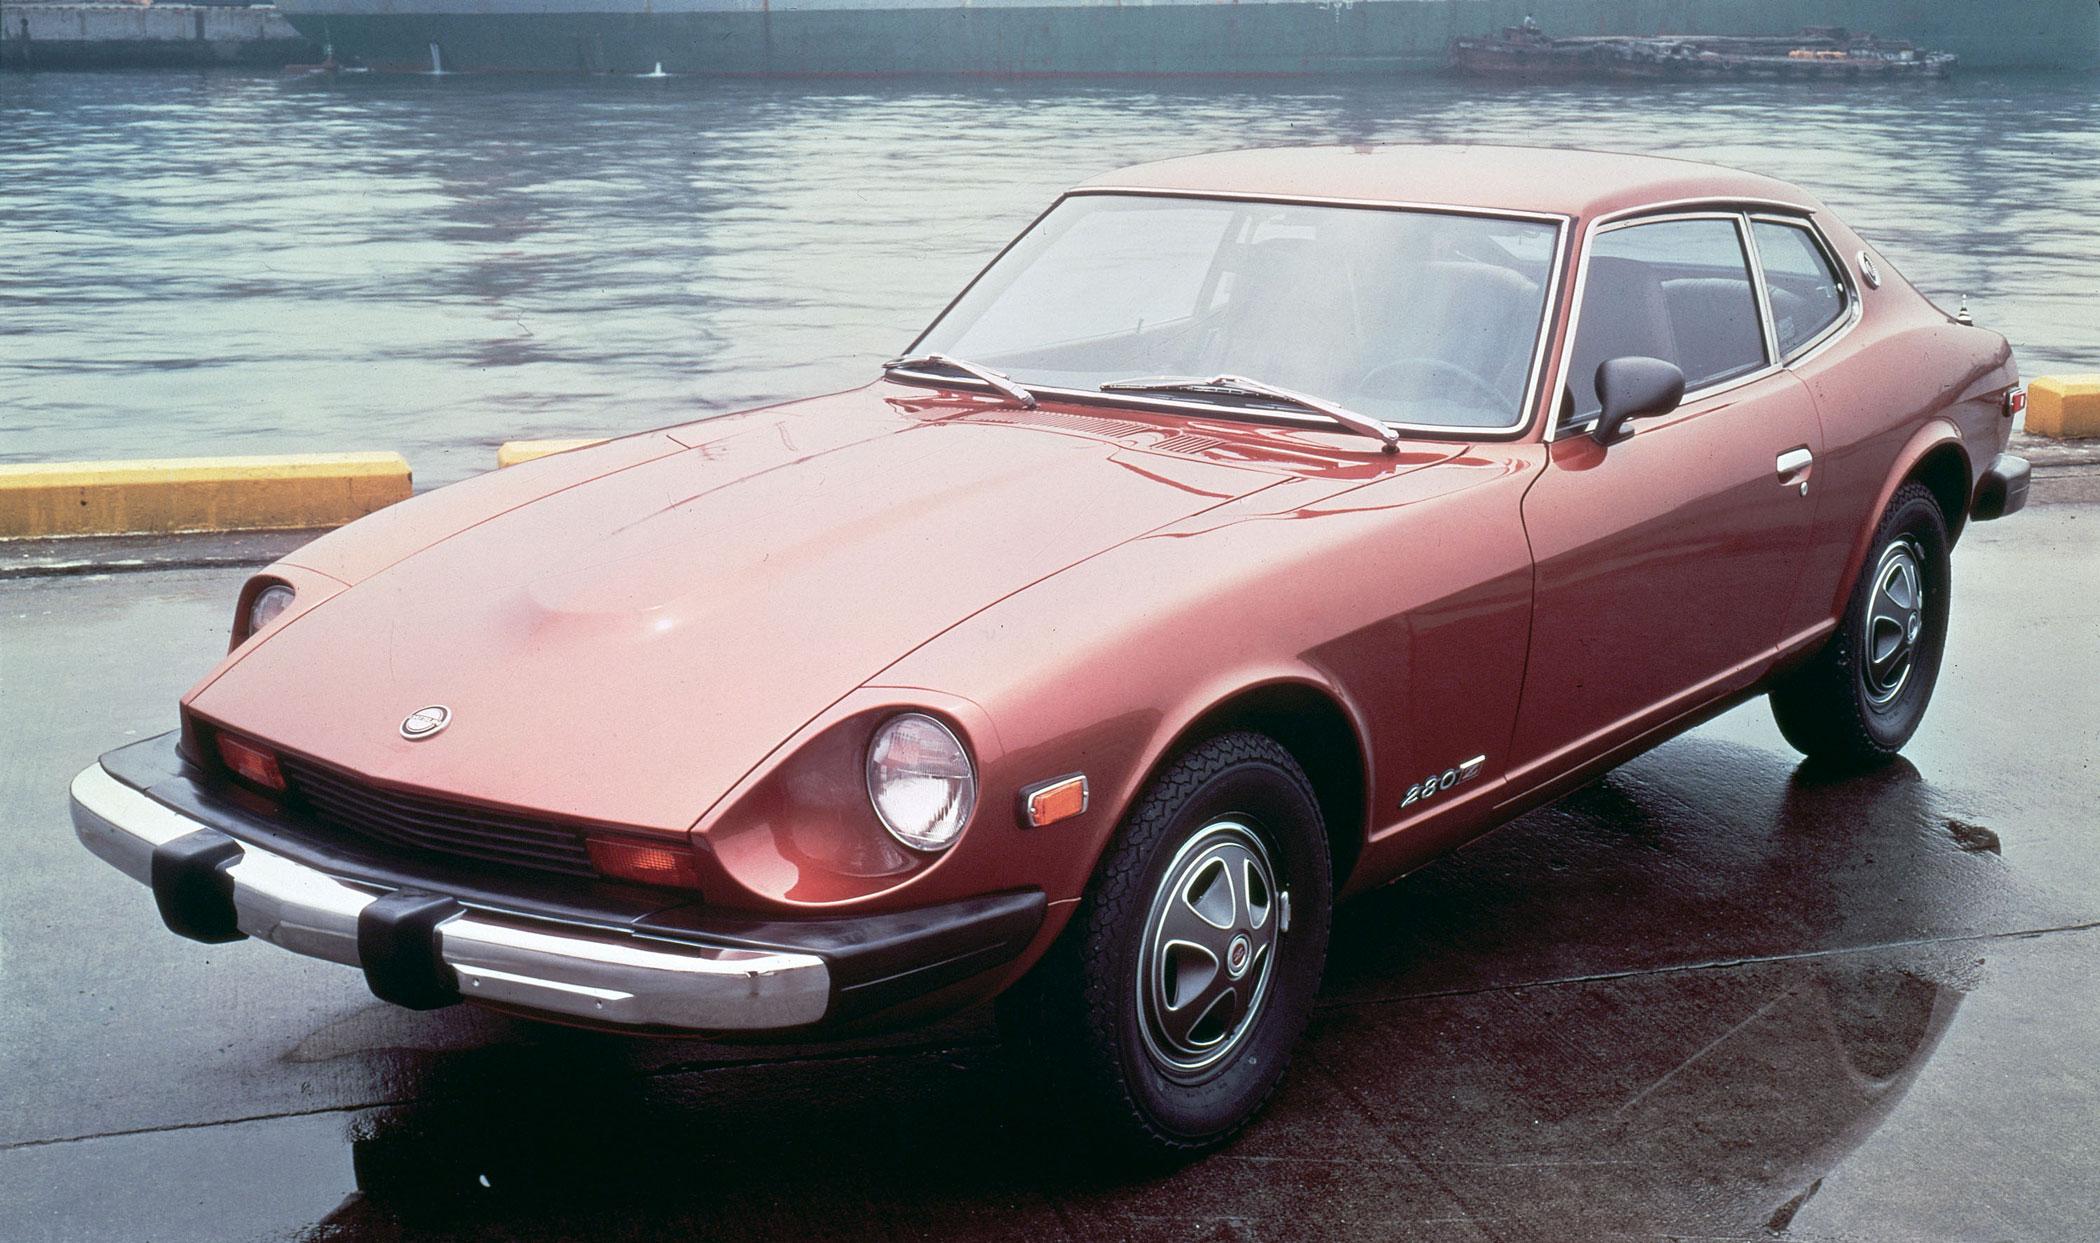 1975 Datsun 240Z